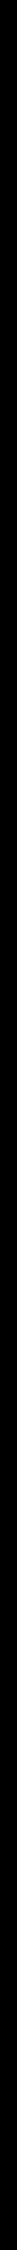 black copy 4.jpg